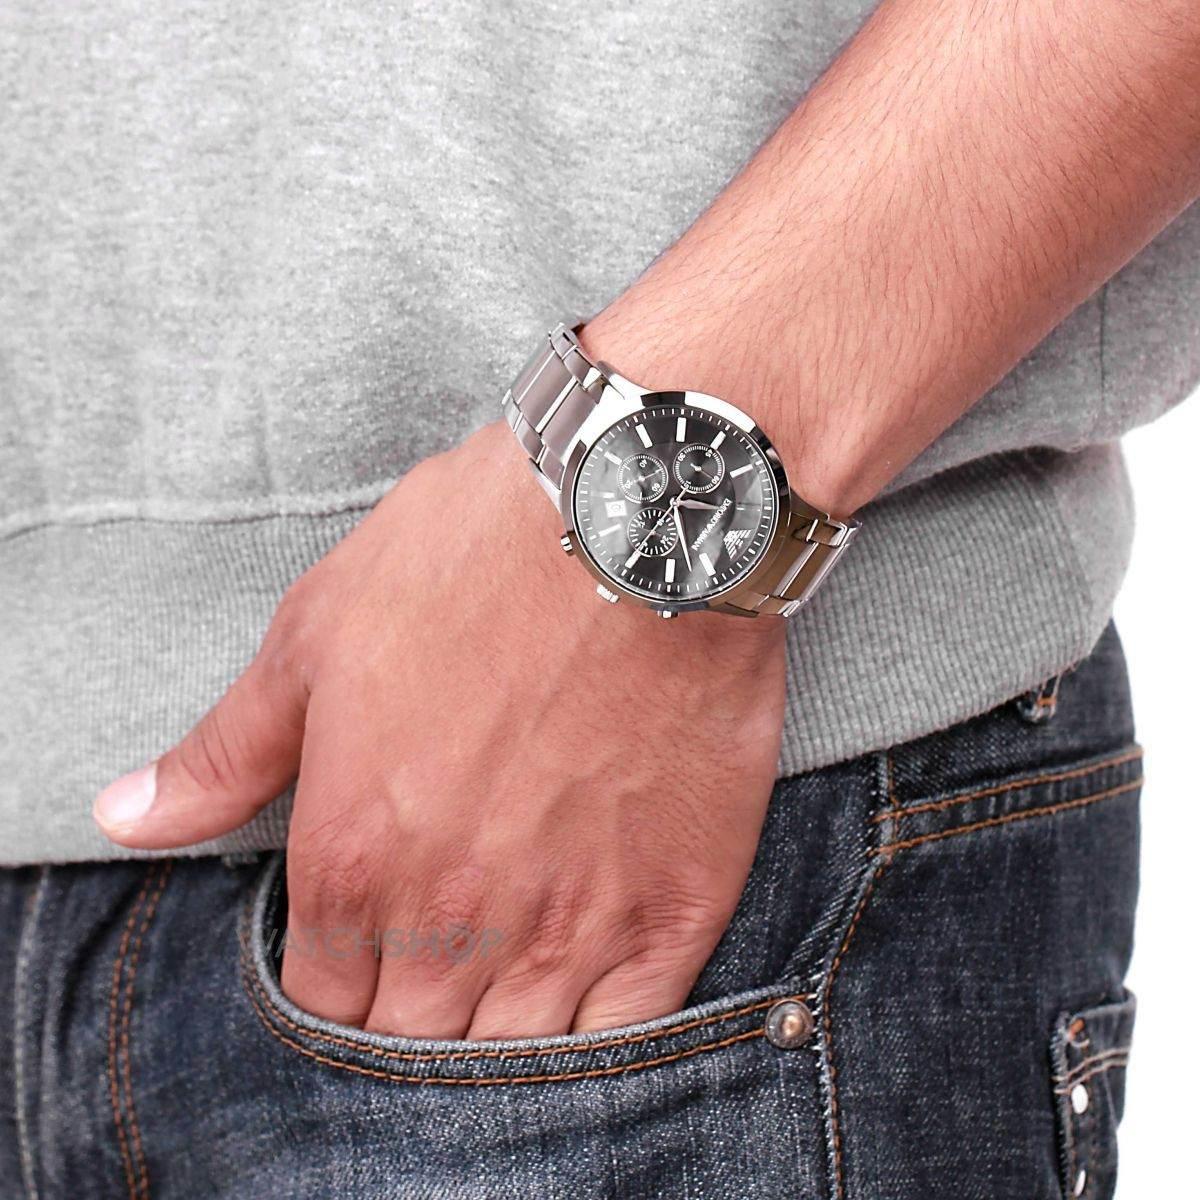 deaee067c1b relógio emporio armani ar2434 preto original completo. Carregando zoom.